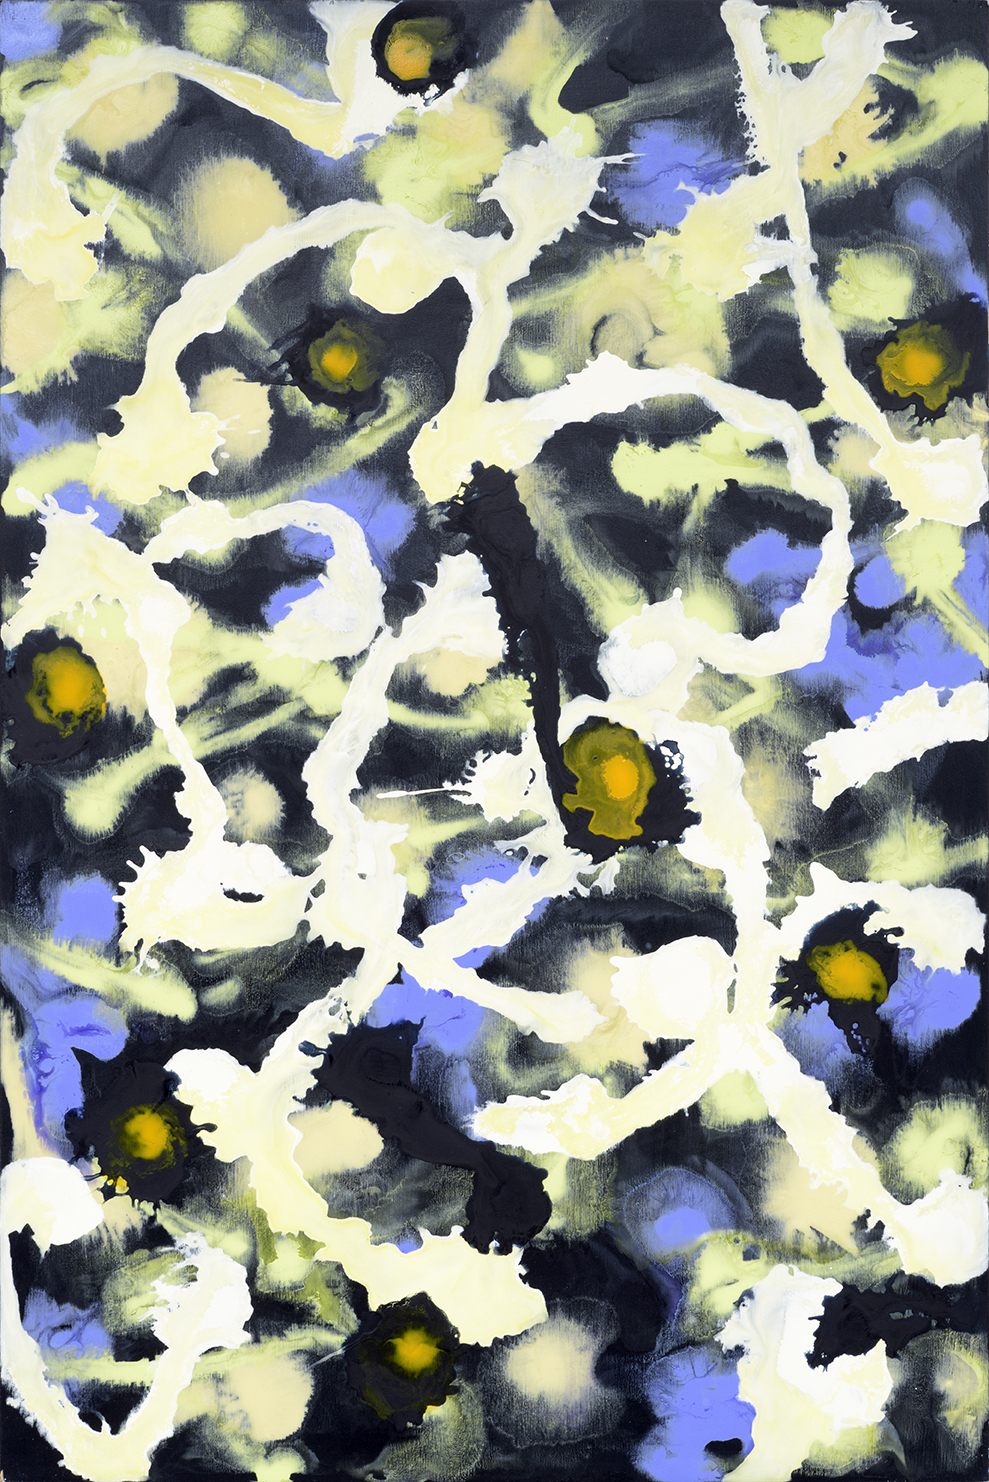 "Daner for Turner / 2   Jerrold Burchman  BU298  Acrylic on Wood Panel  36"" x 24"""